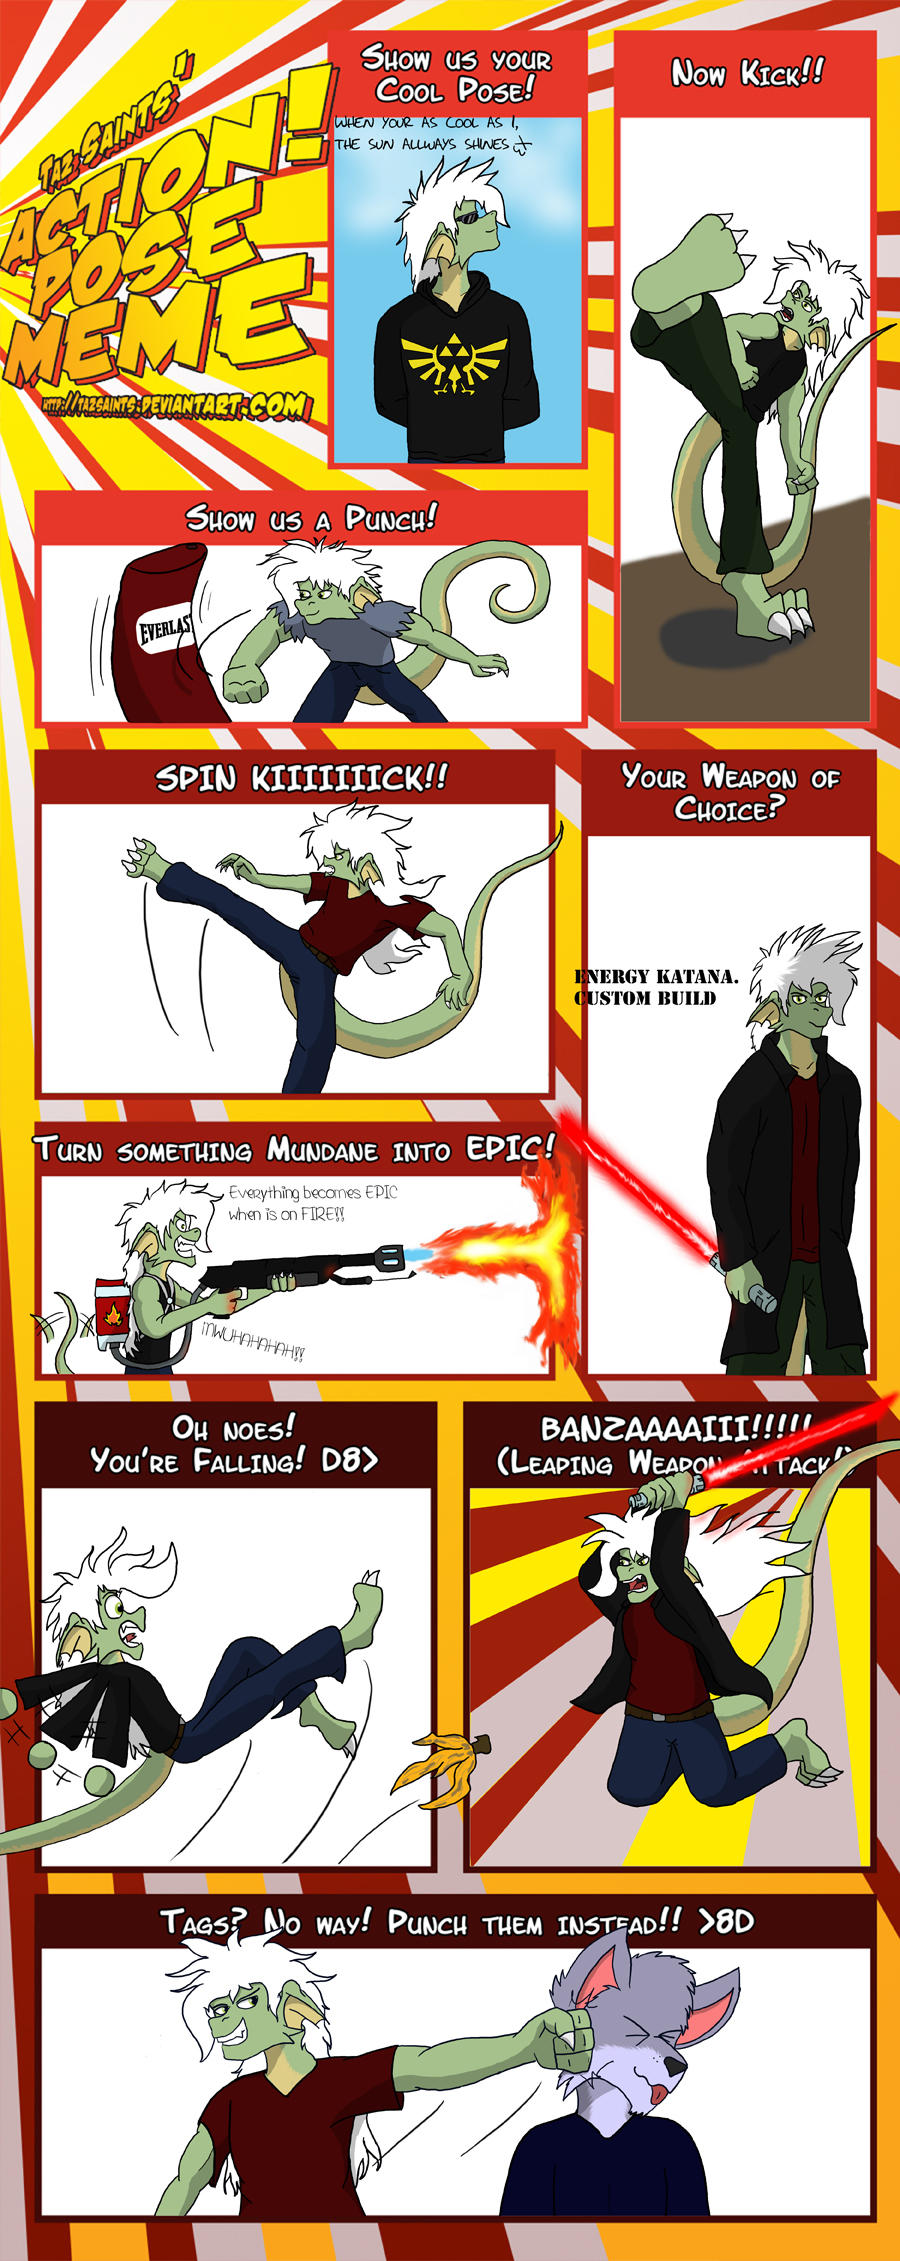 ACTION Pose Meme by Taz by Dragon-Furry